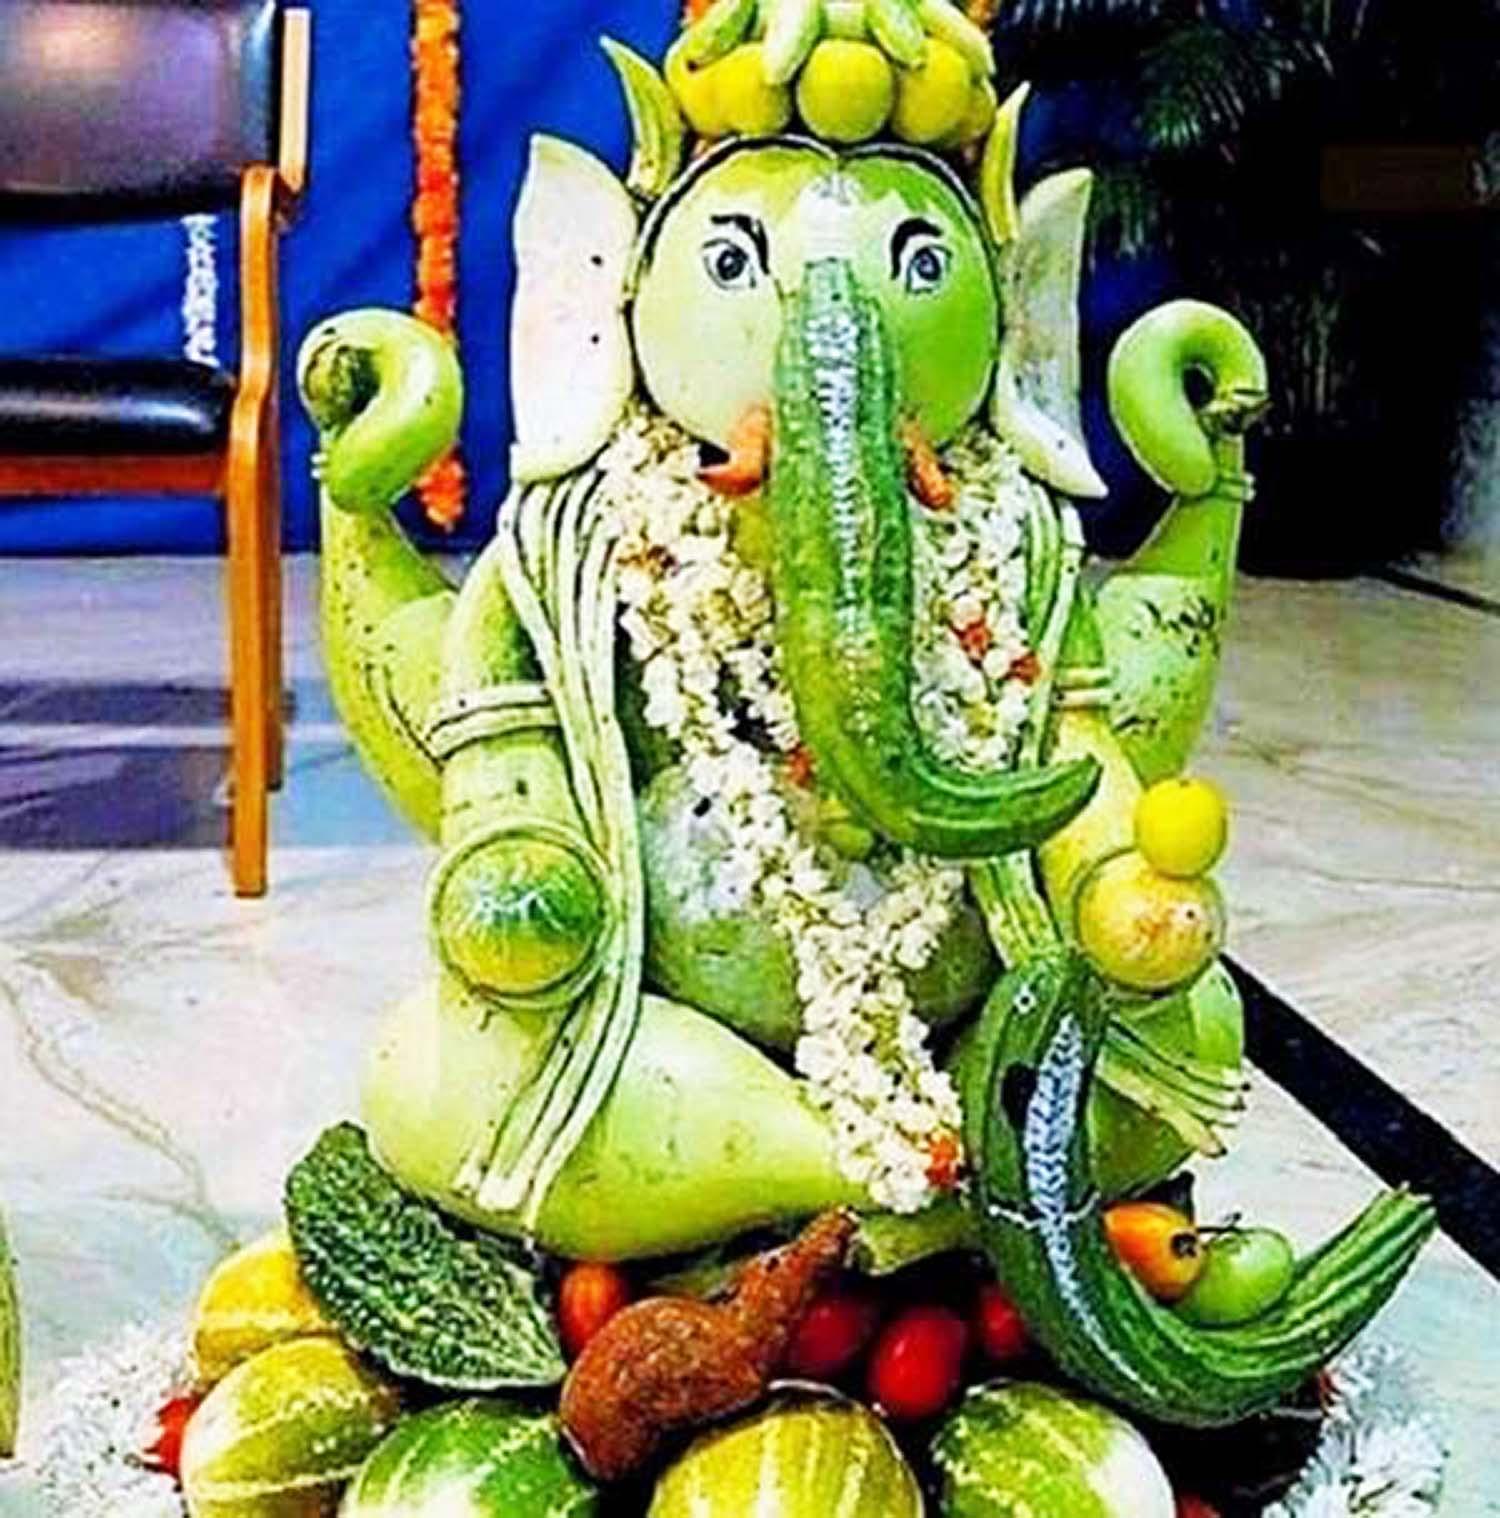 Edible Eco friendly ganesha idol!